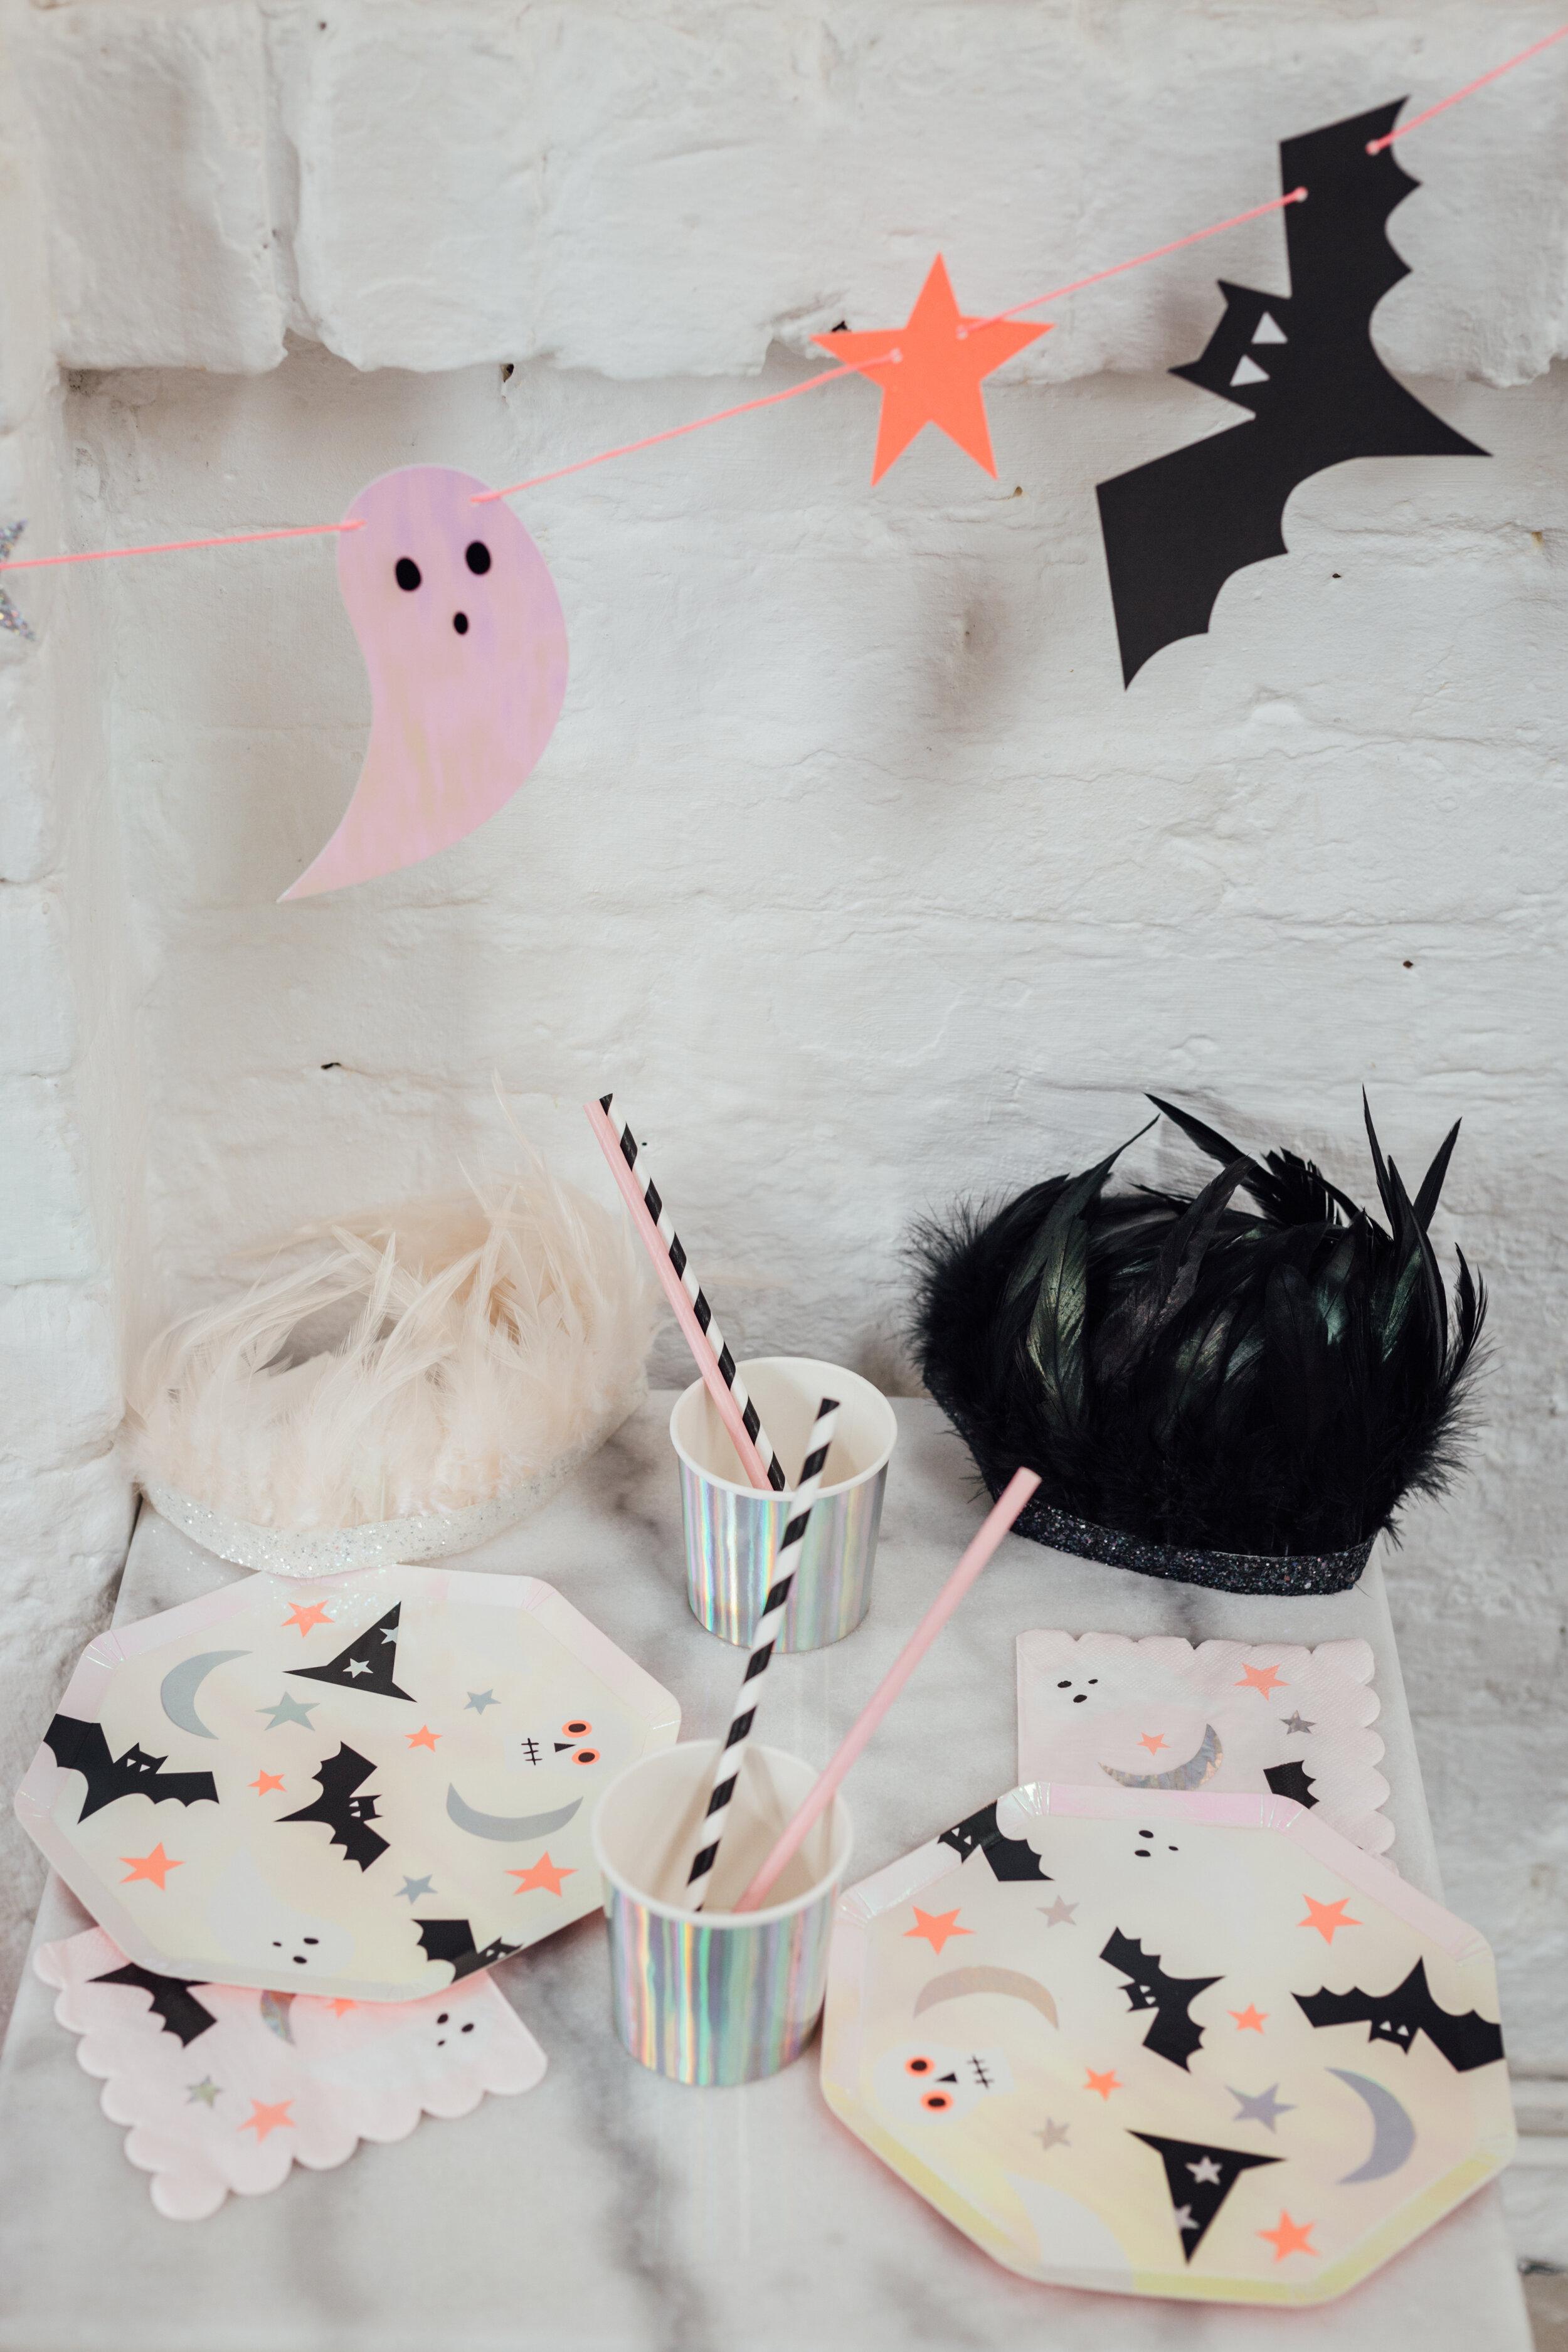 halloween 2019 otherletters-8.jpg